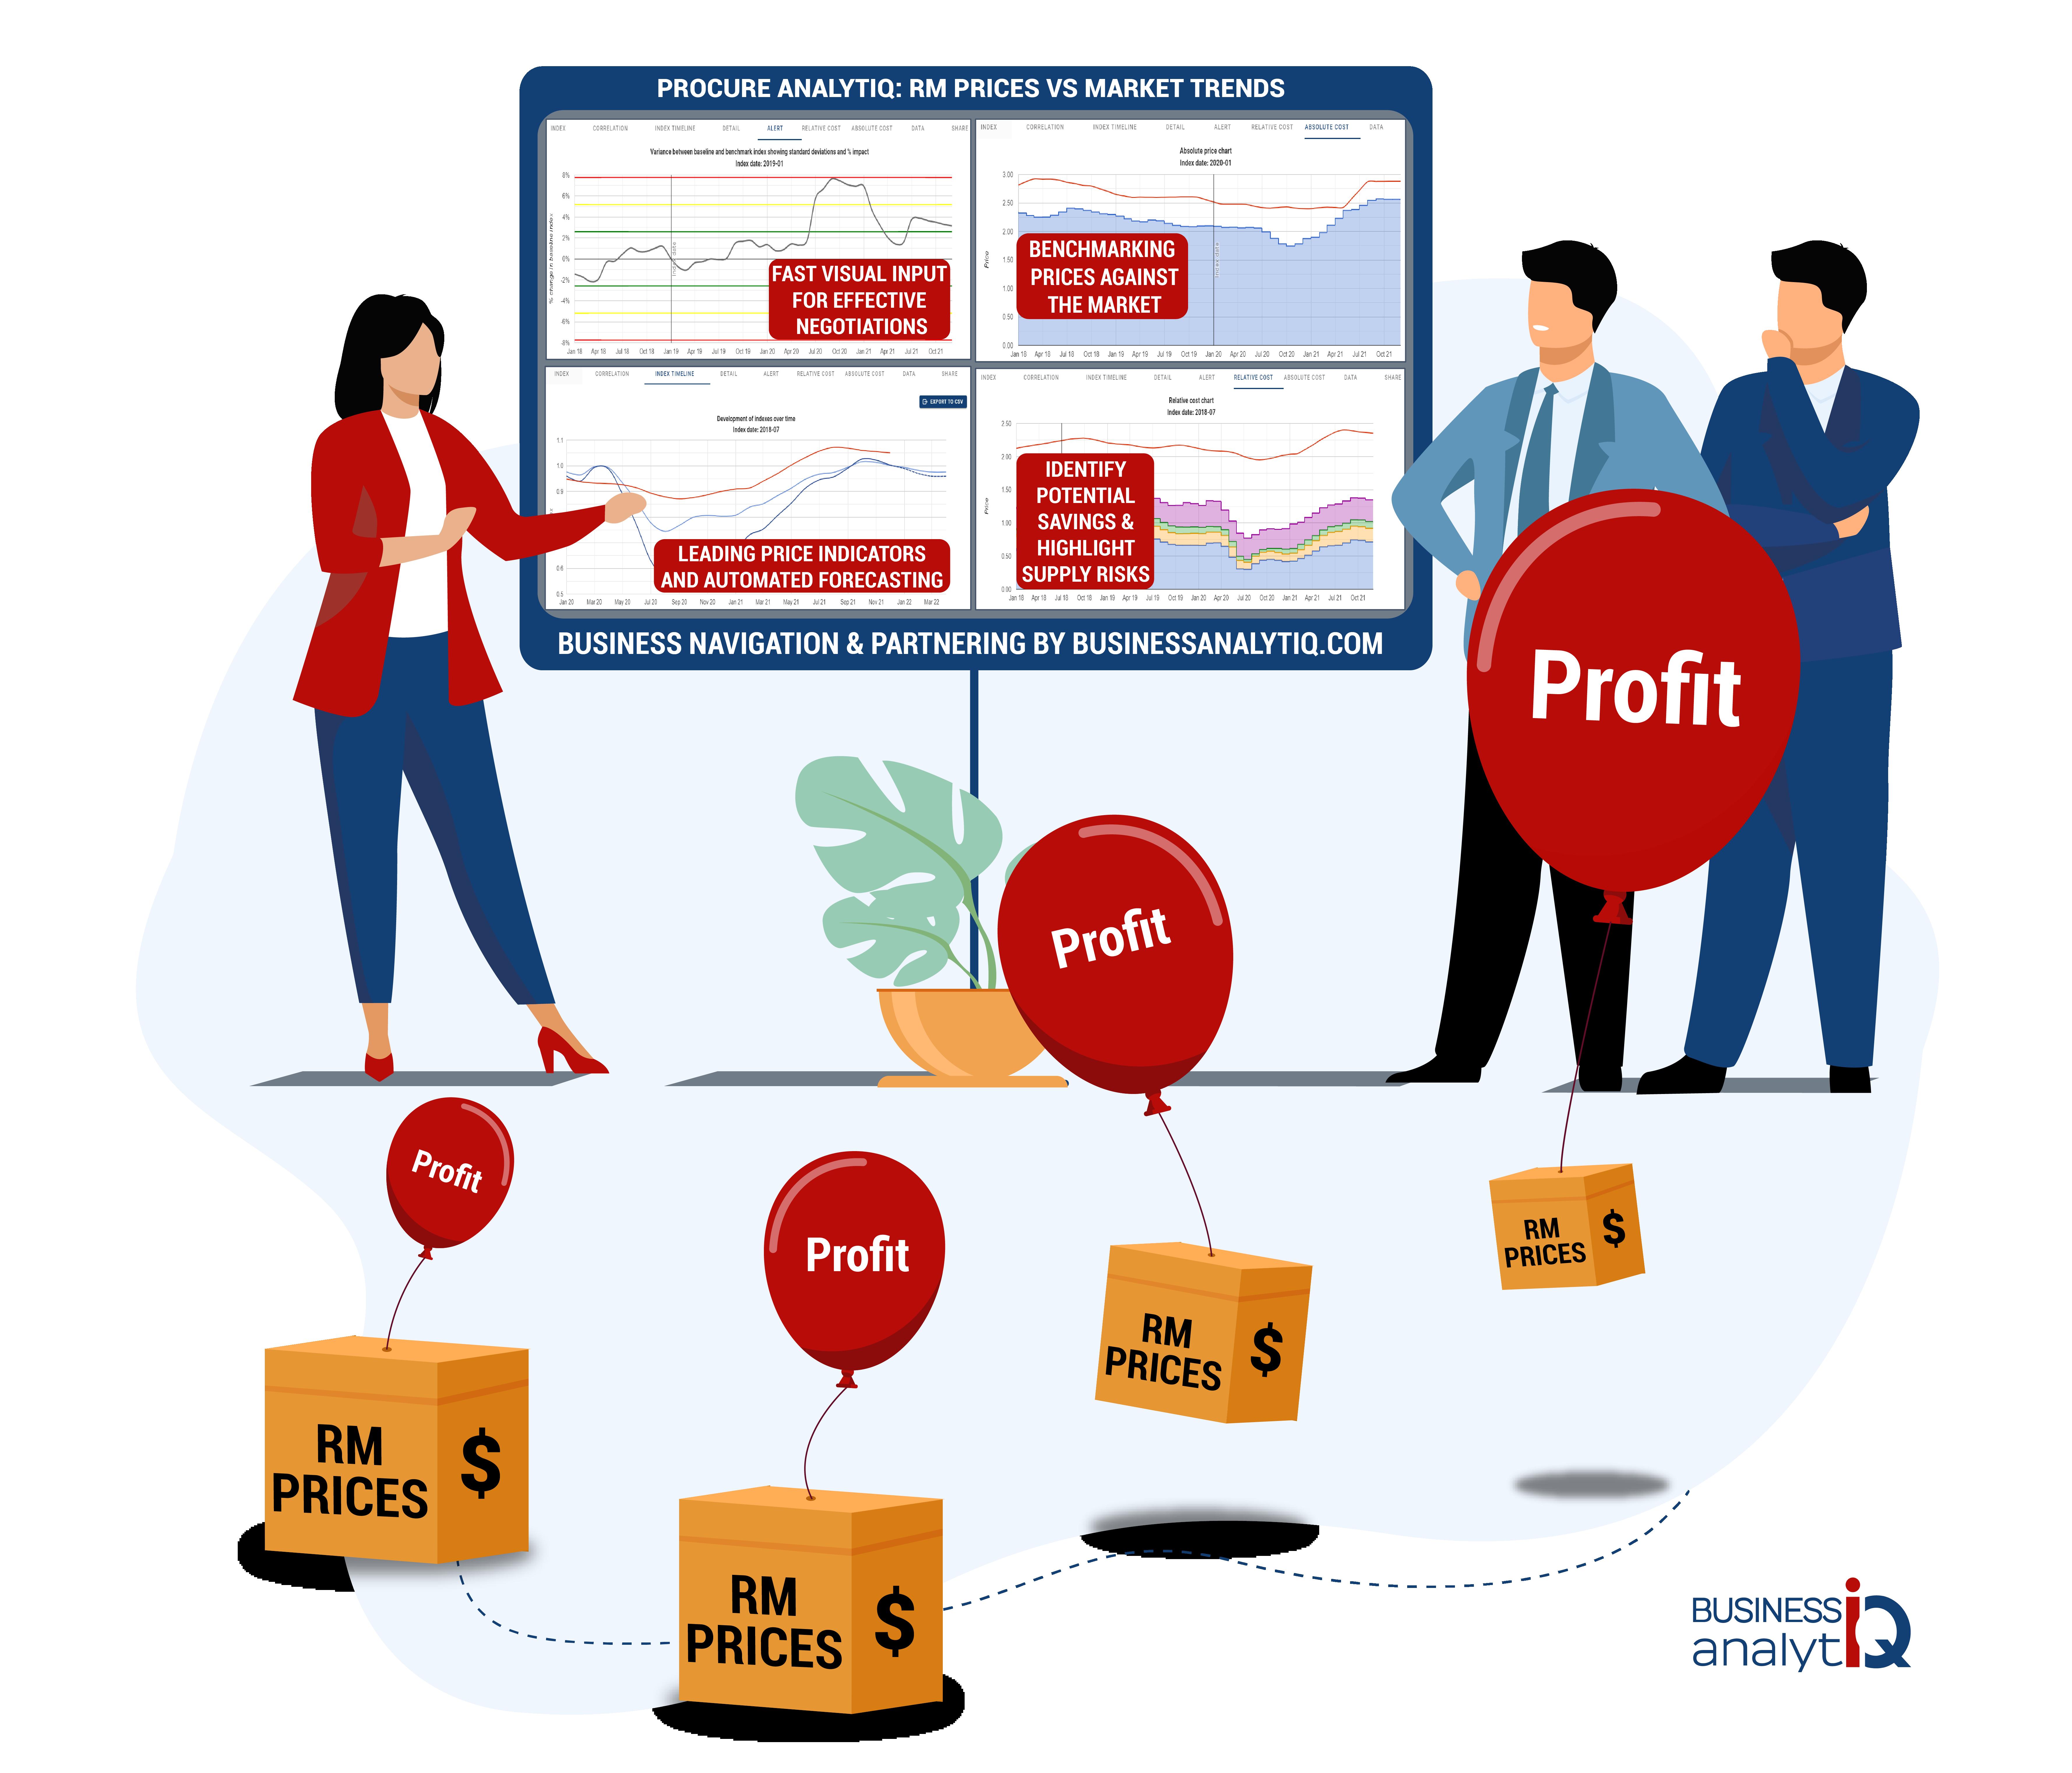 procureanalytiq procurement analytics